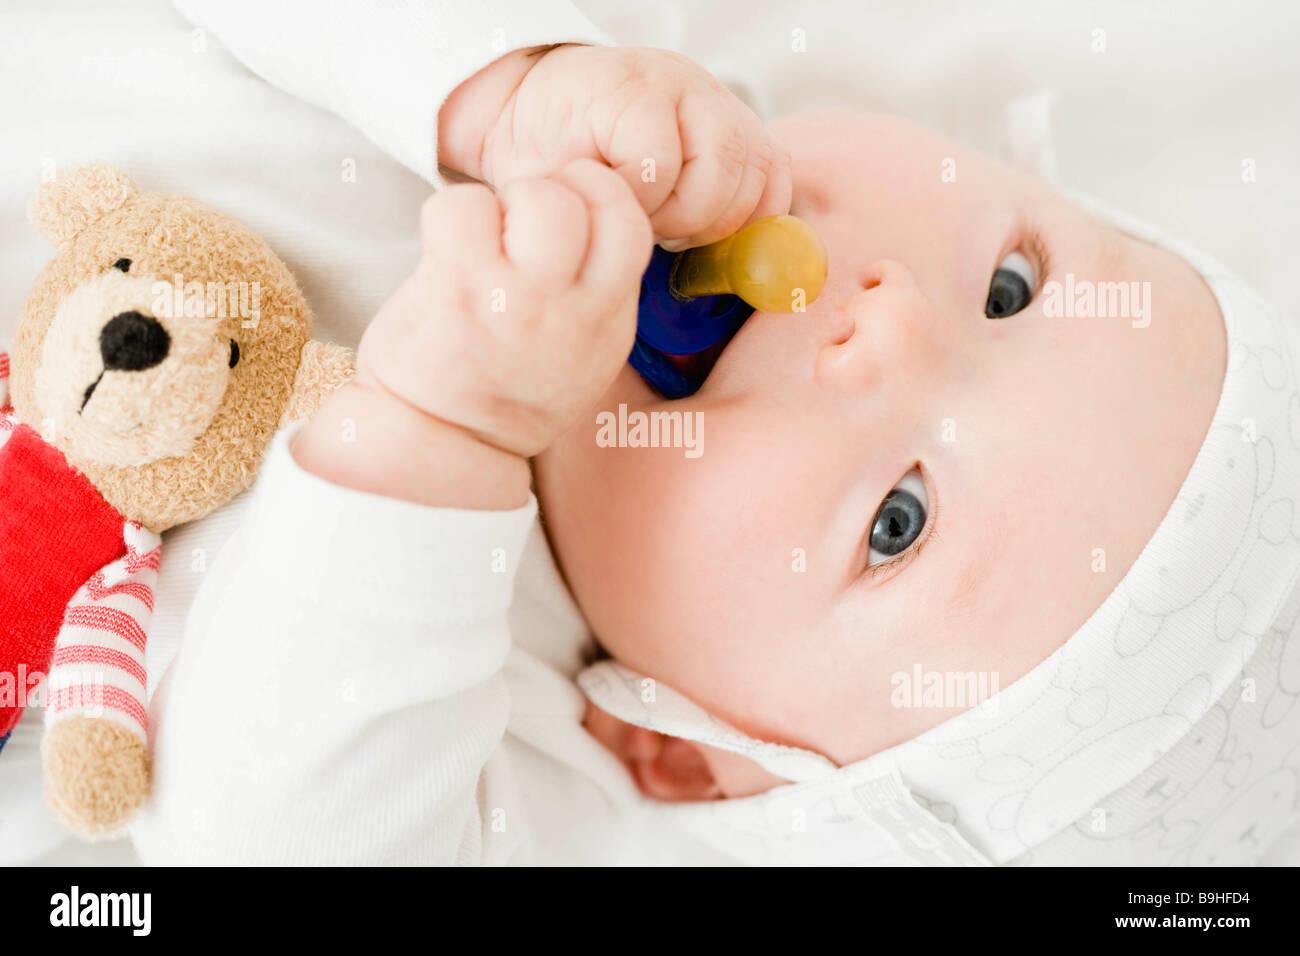 Baby knabbert an Schnuller Stockbild